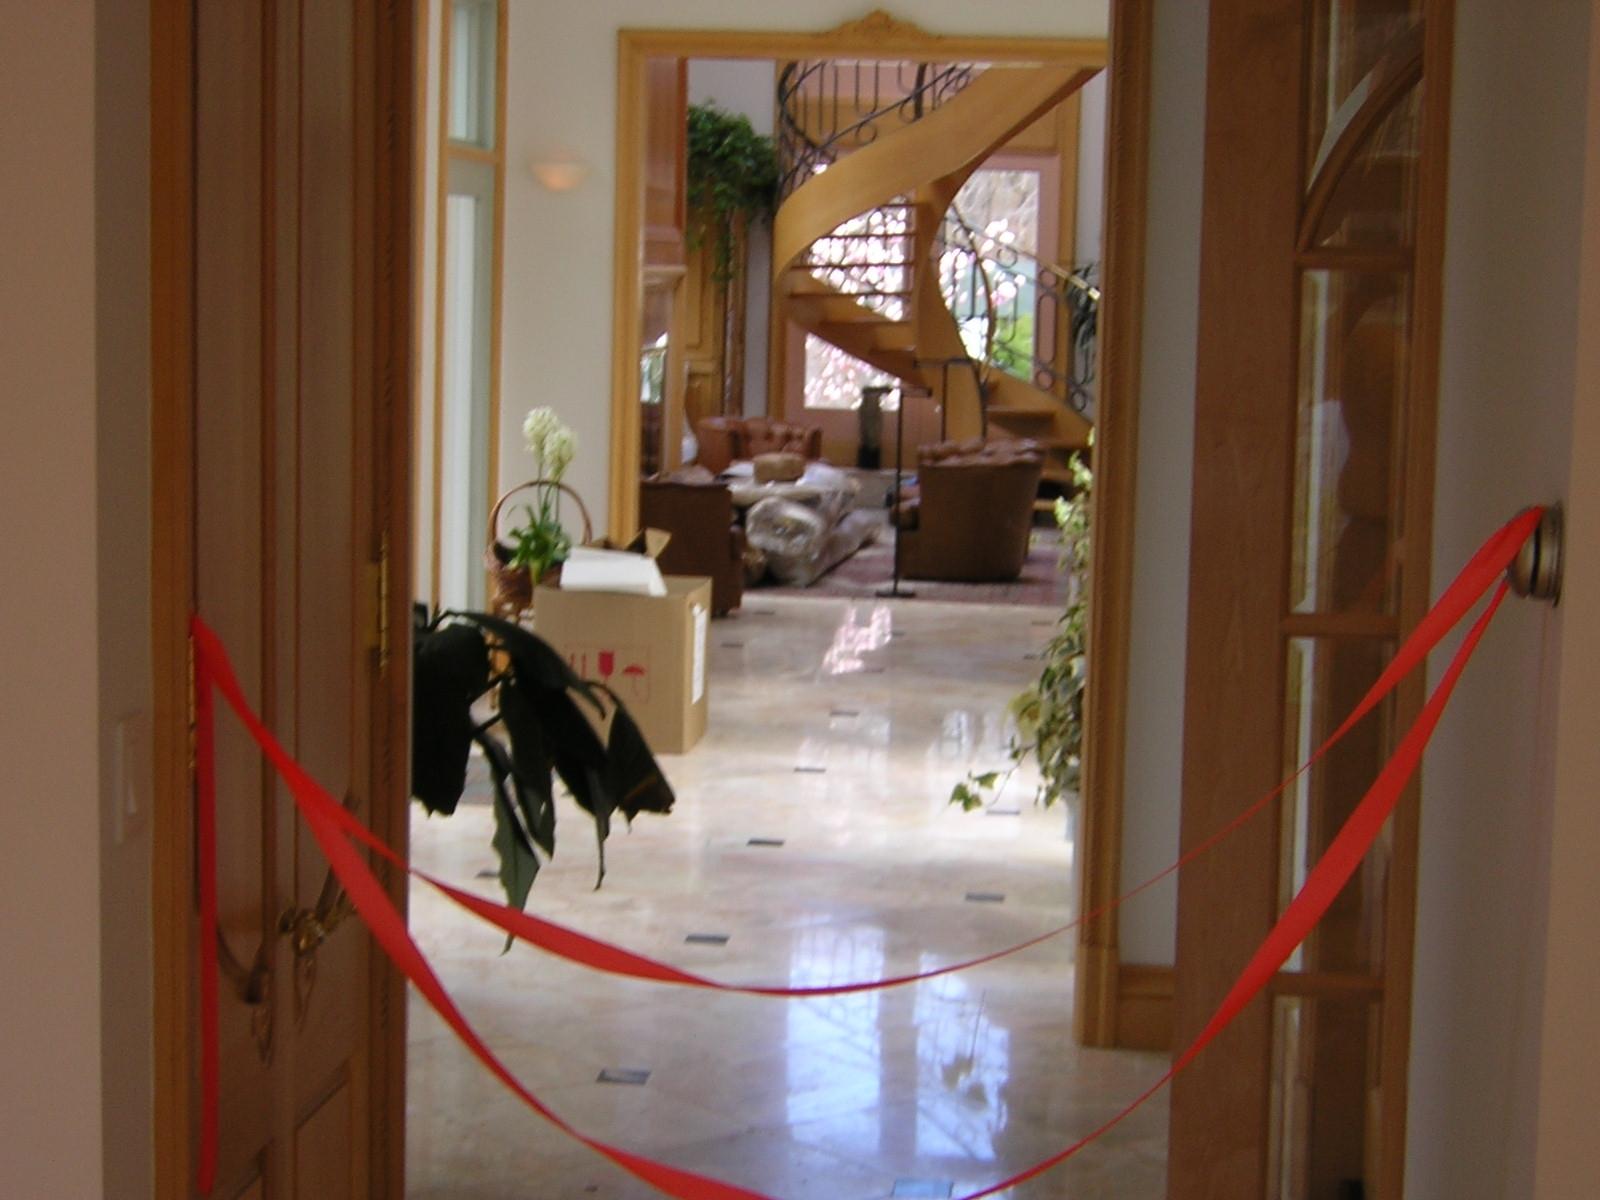 Stylish Floors N' More Inc image 5